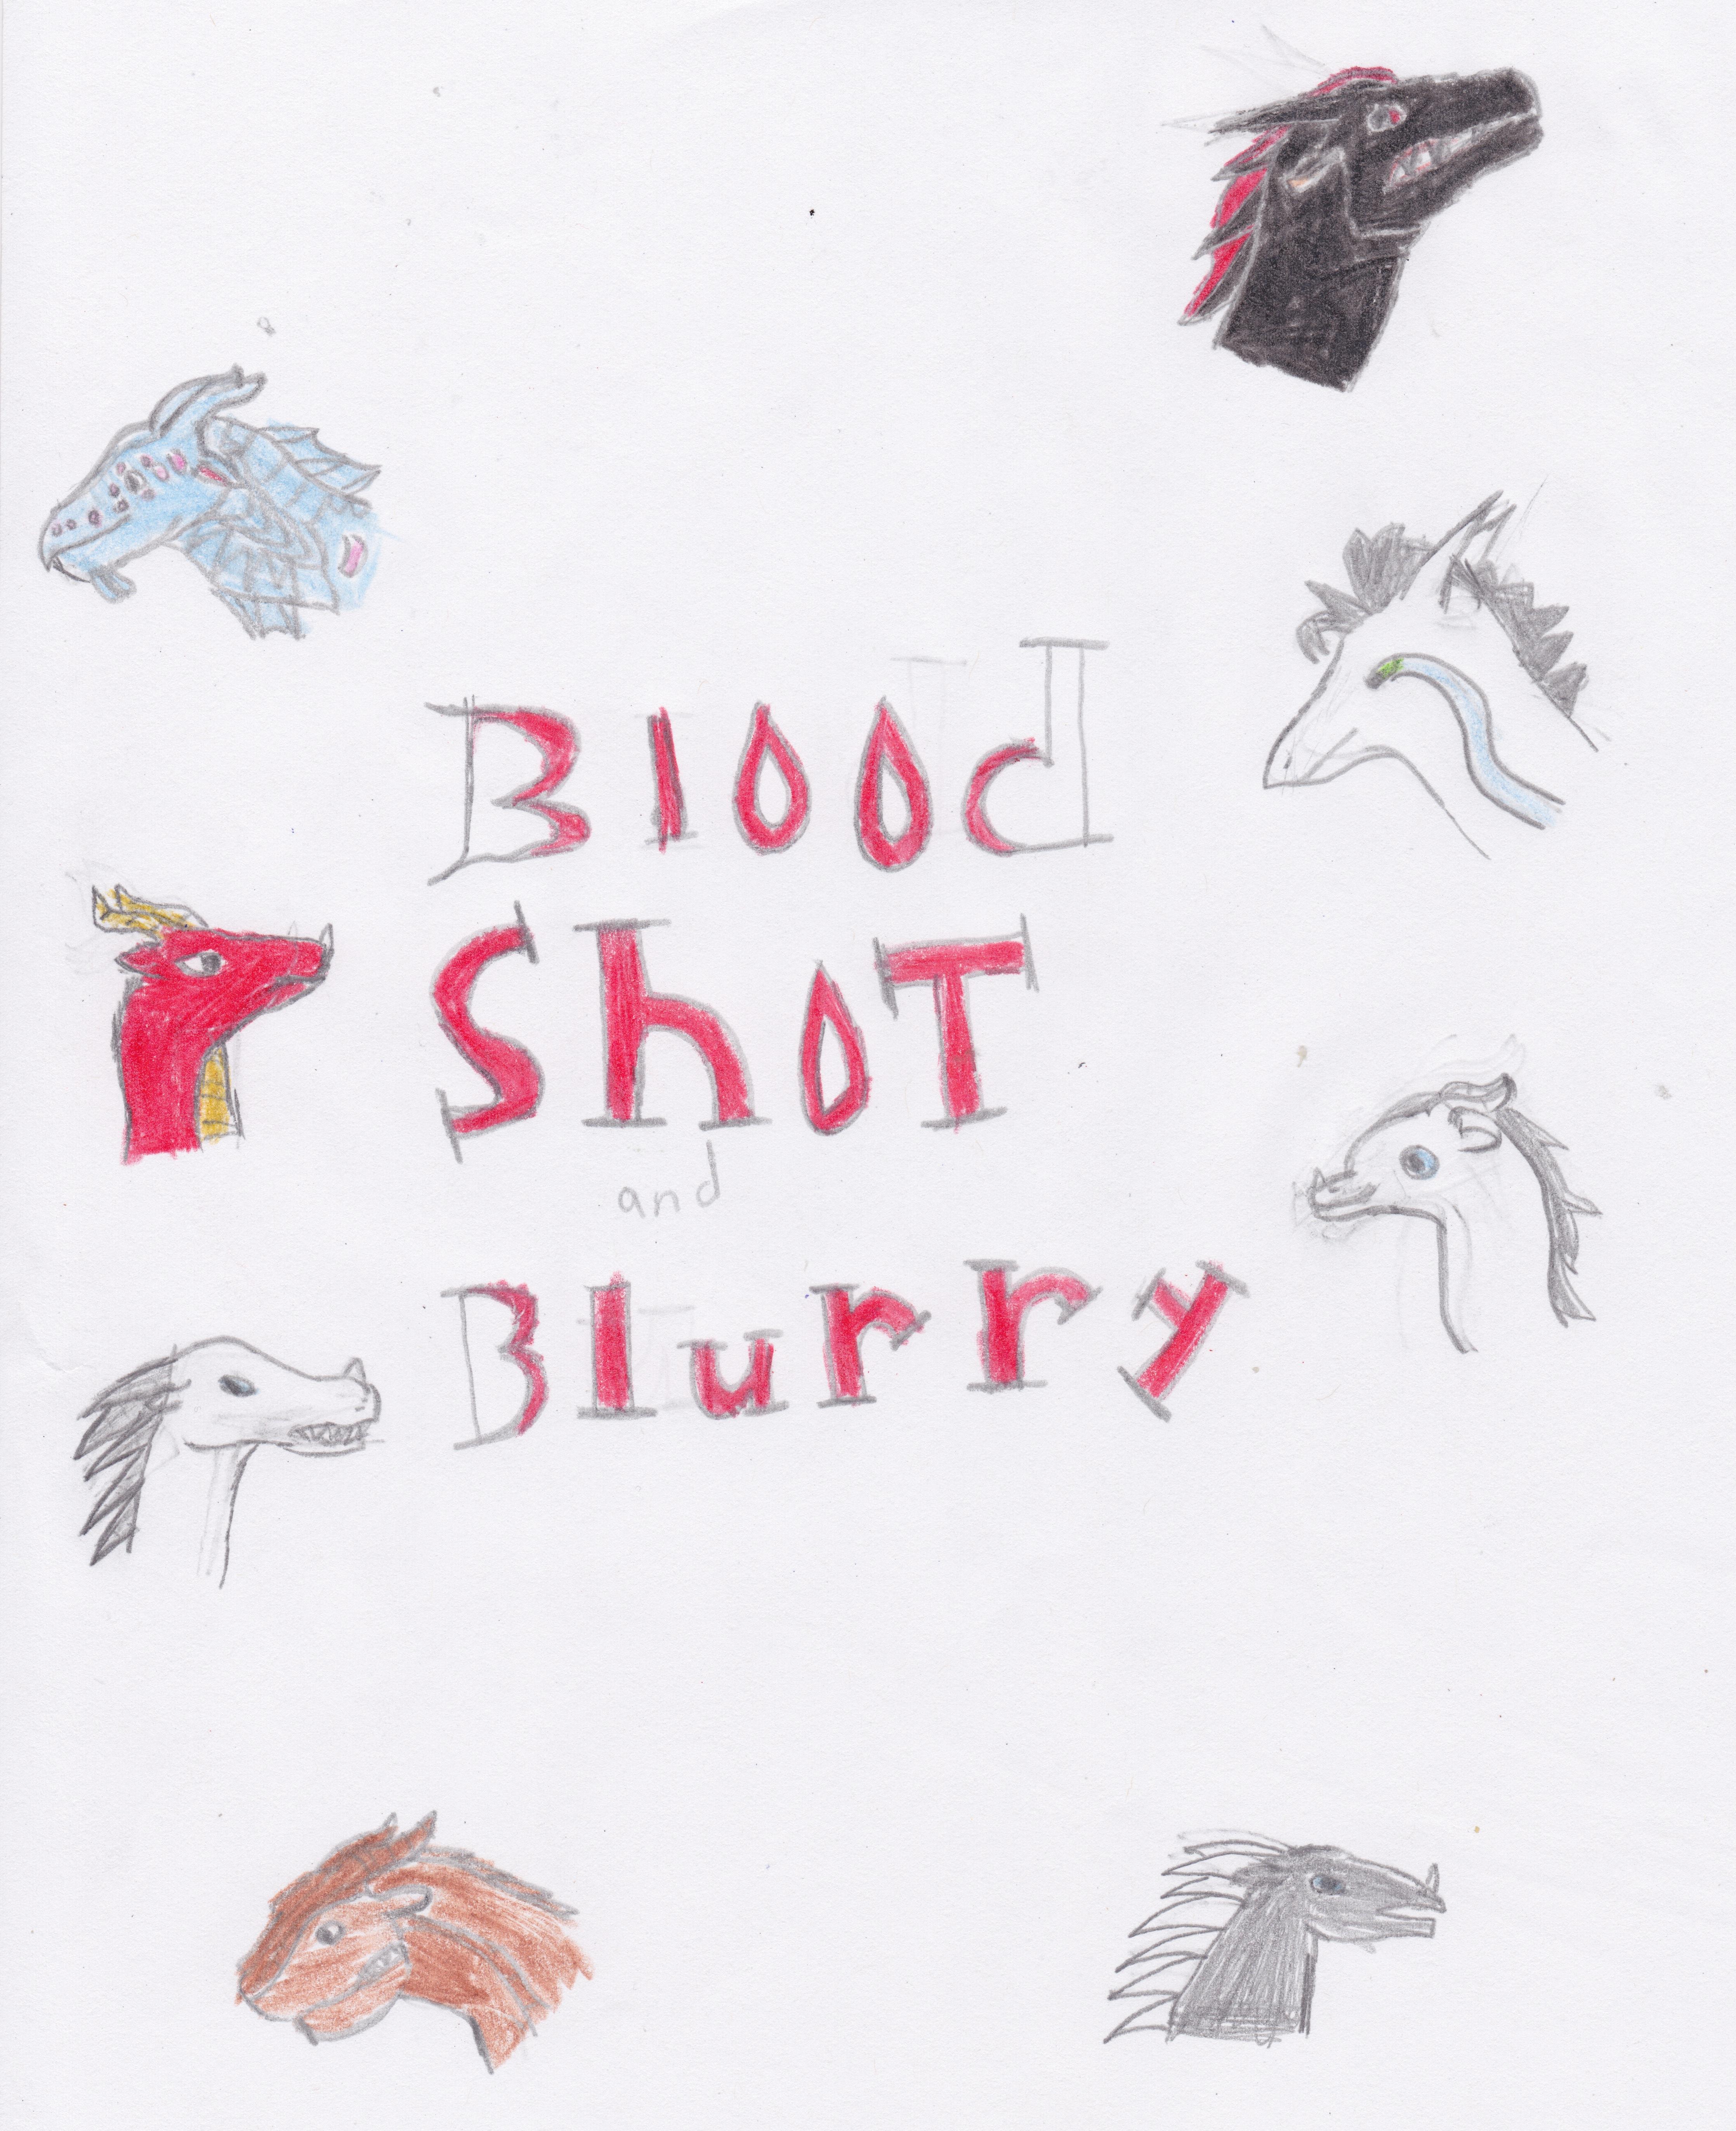 Bloodshot and Blurry